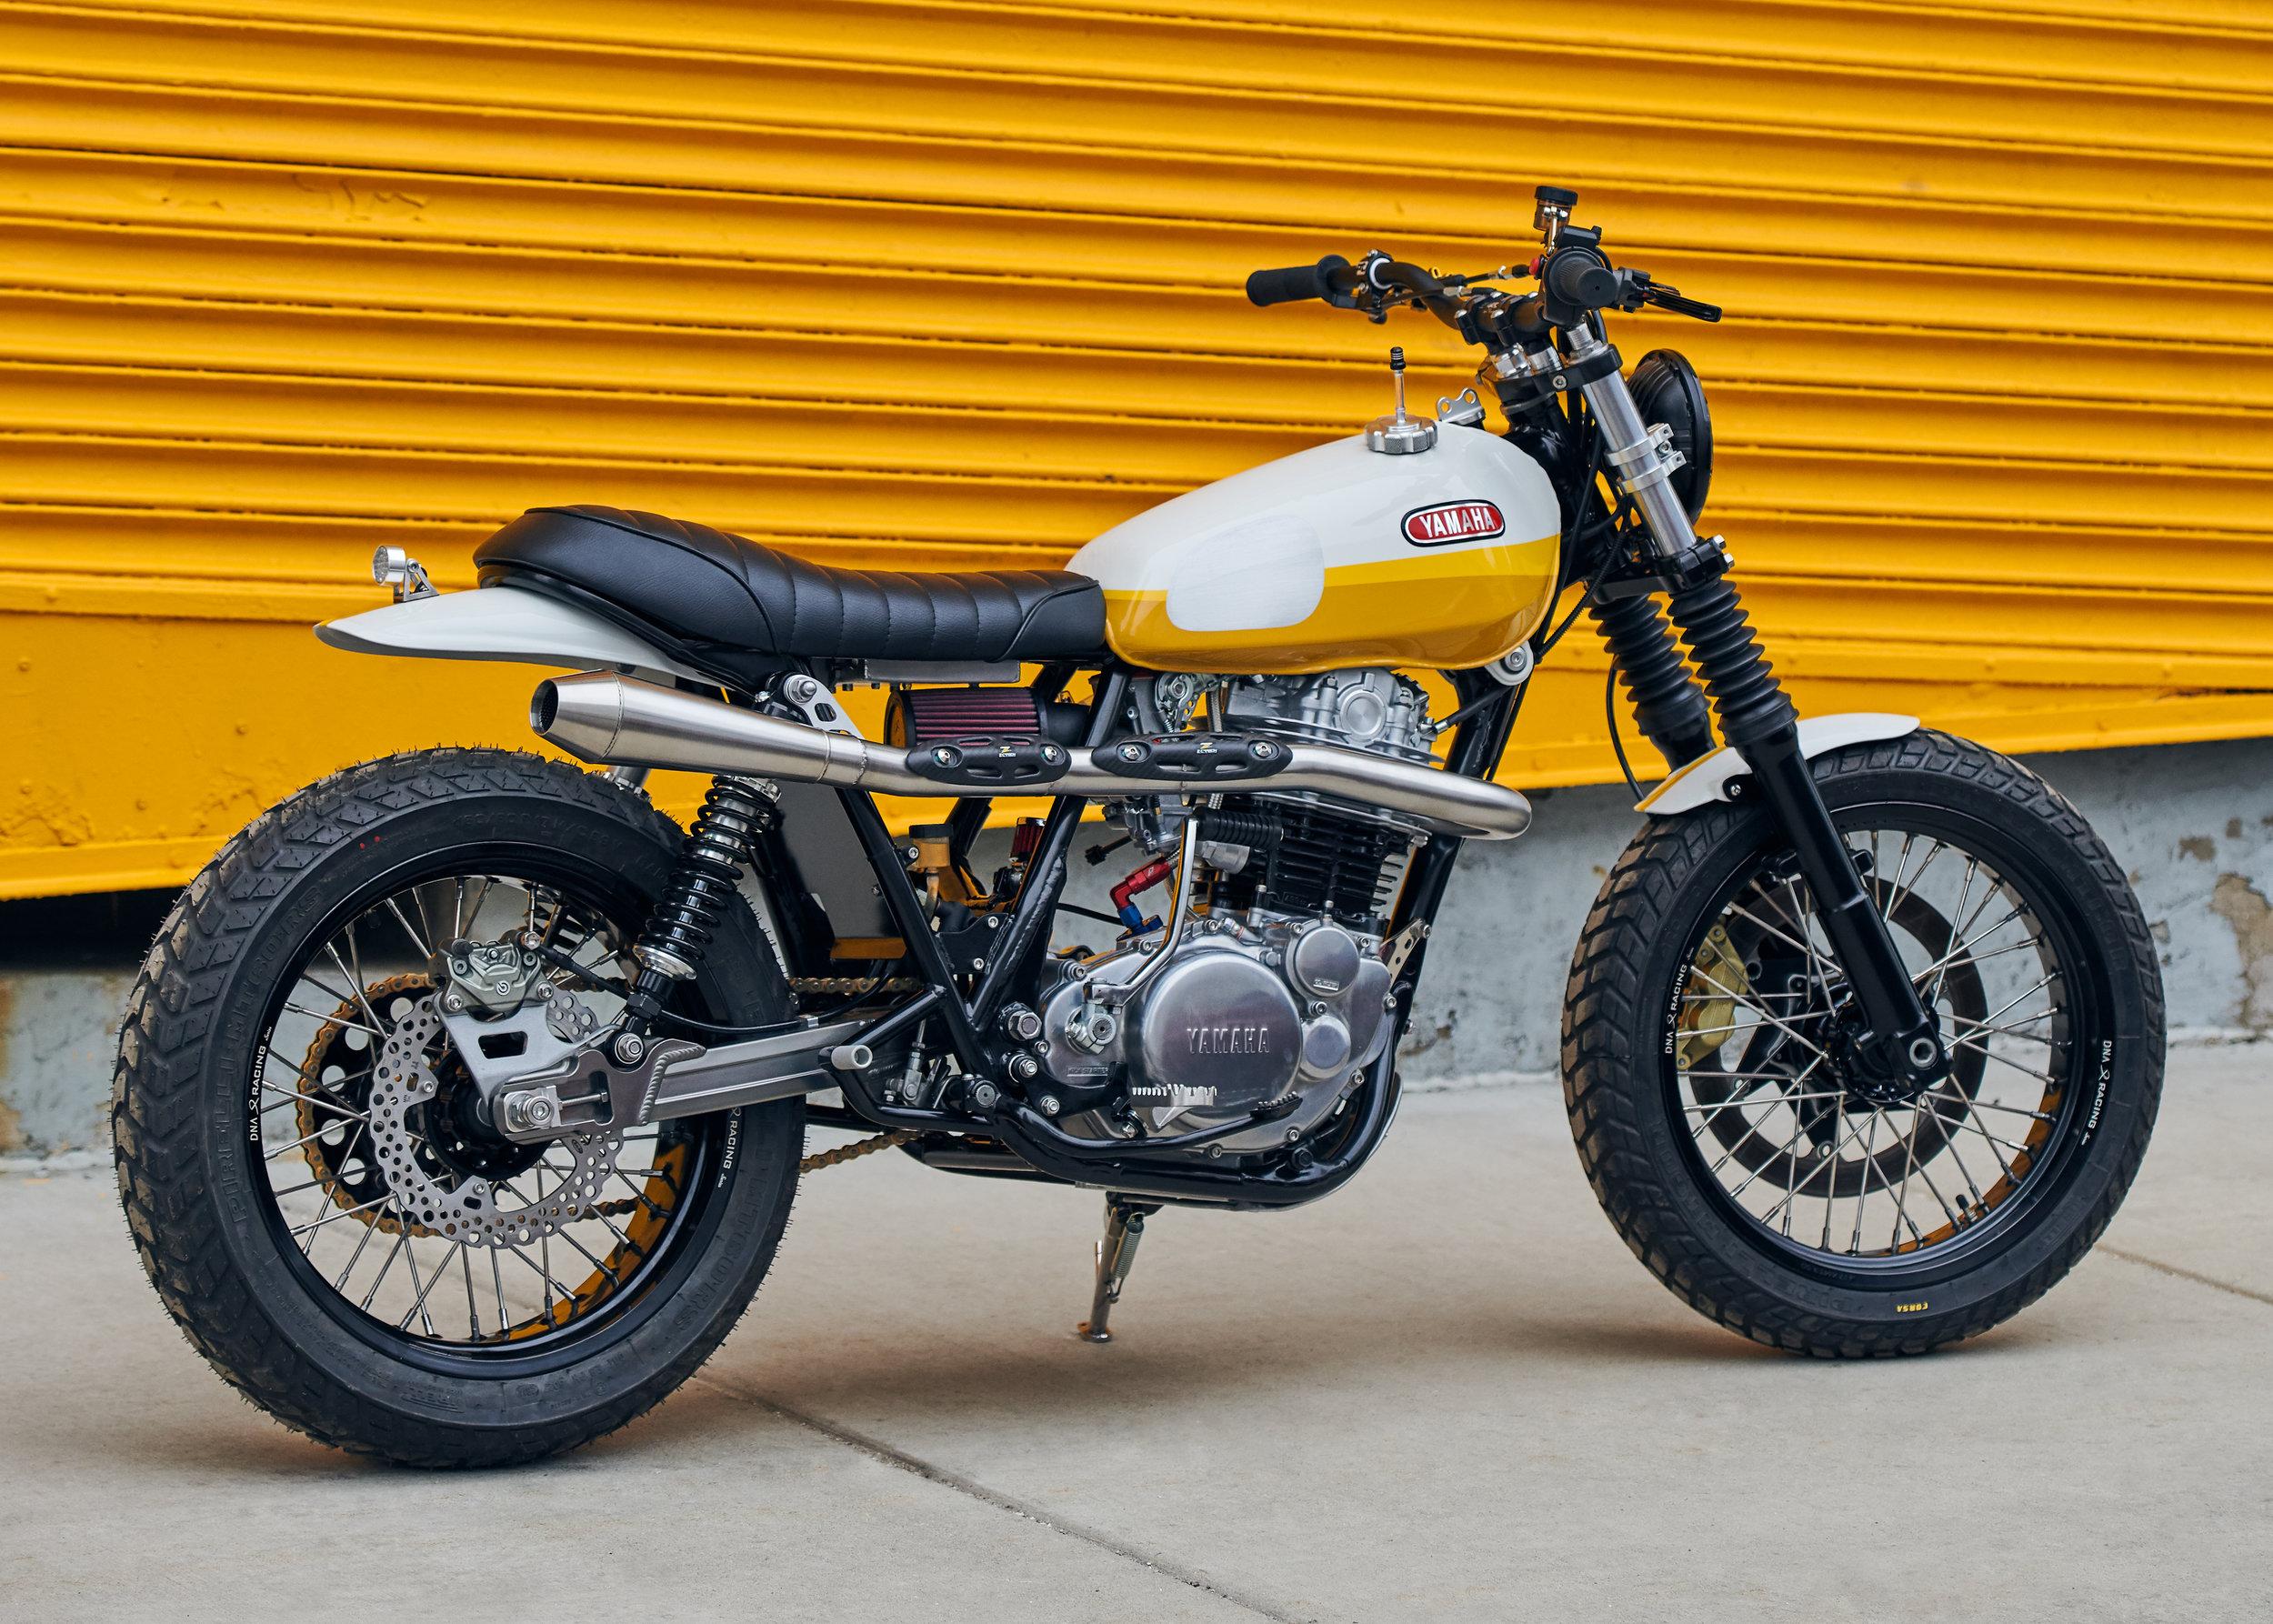 Yamaha_Custom_Tracker_SR500_Daniel_Peter_Moto-Mucci (4)